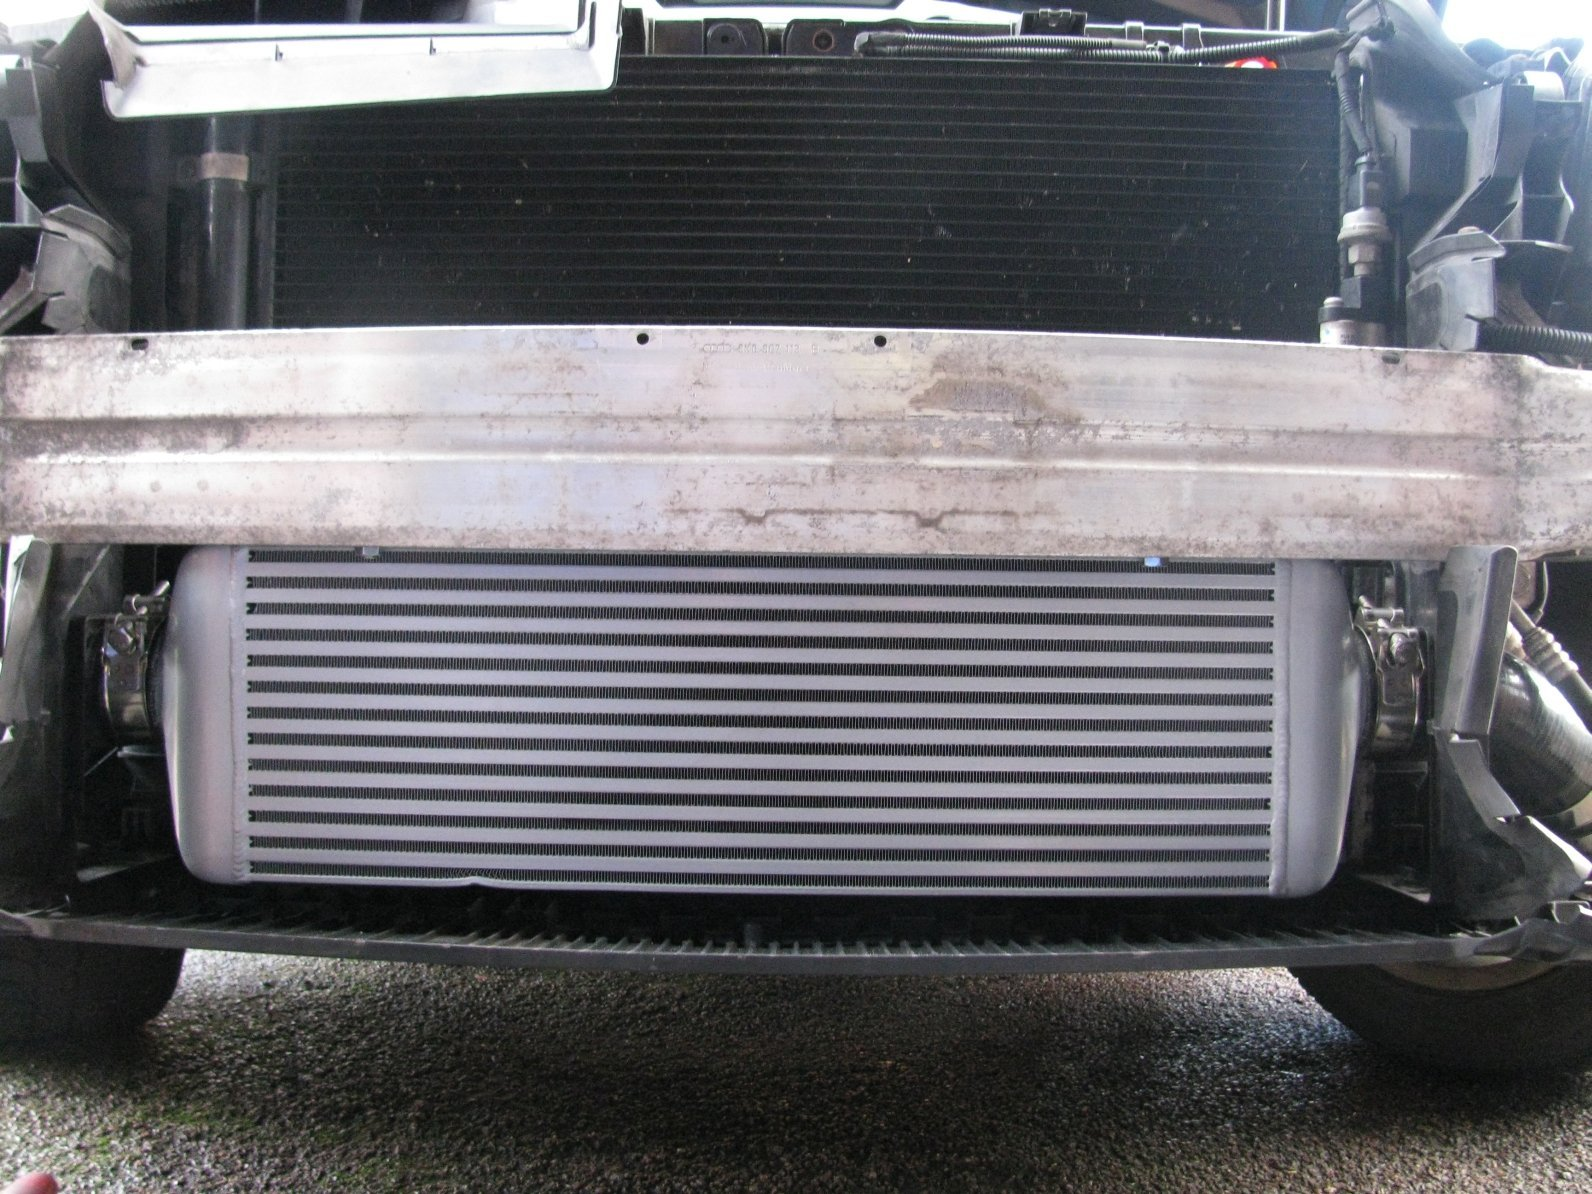 Karls 30 Tdi Build Thread Page 2 Audi A6 3 0 Fuse Box Img 1618